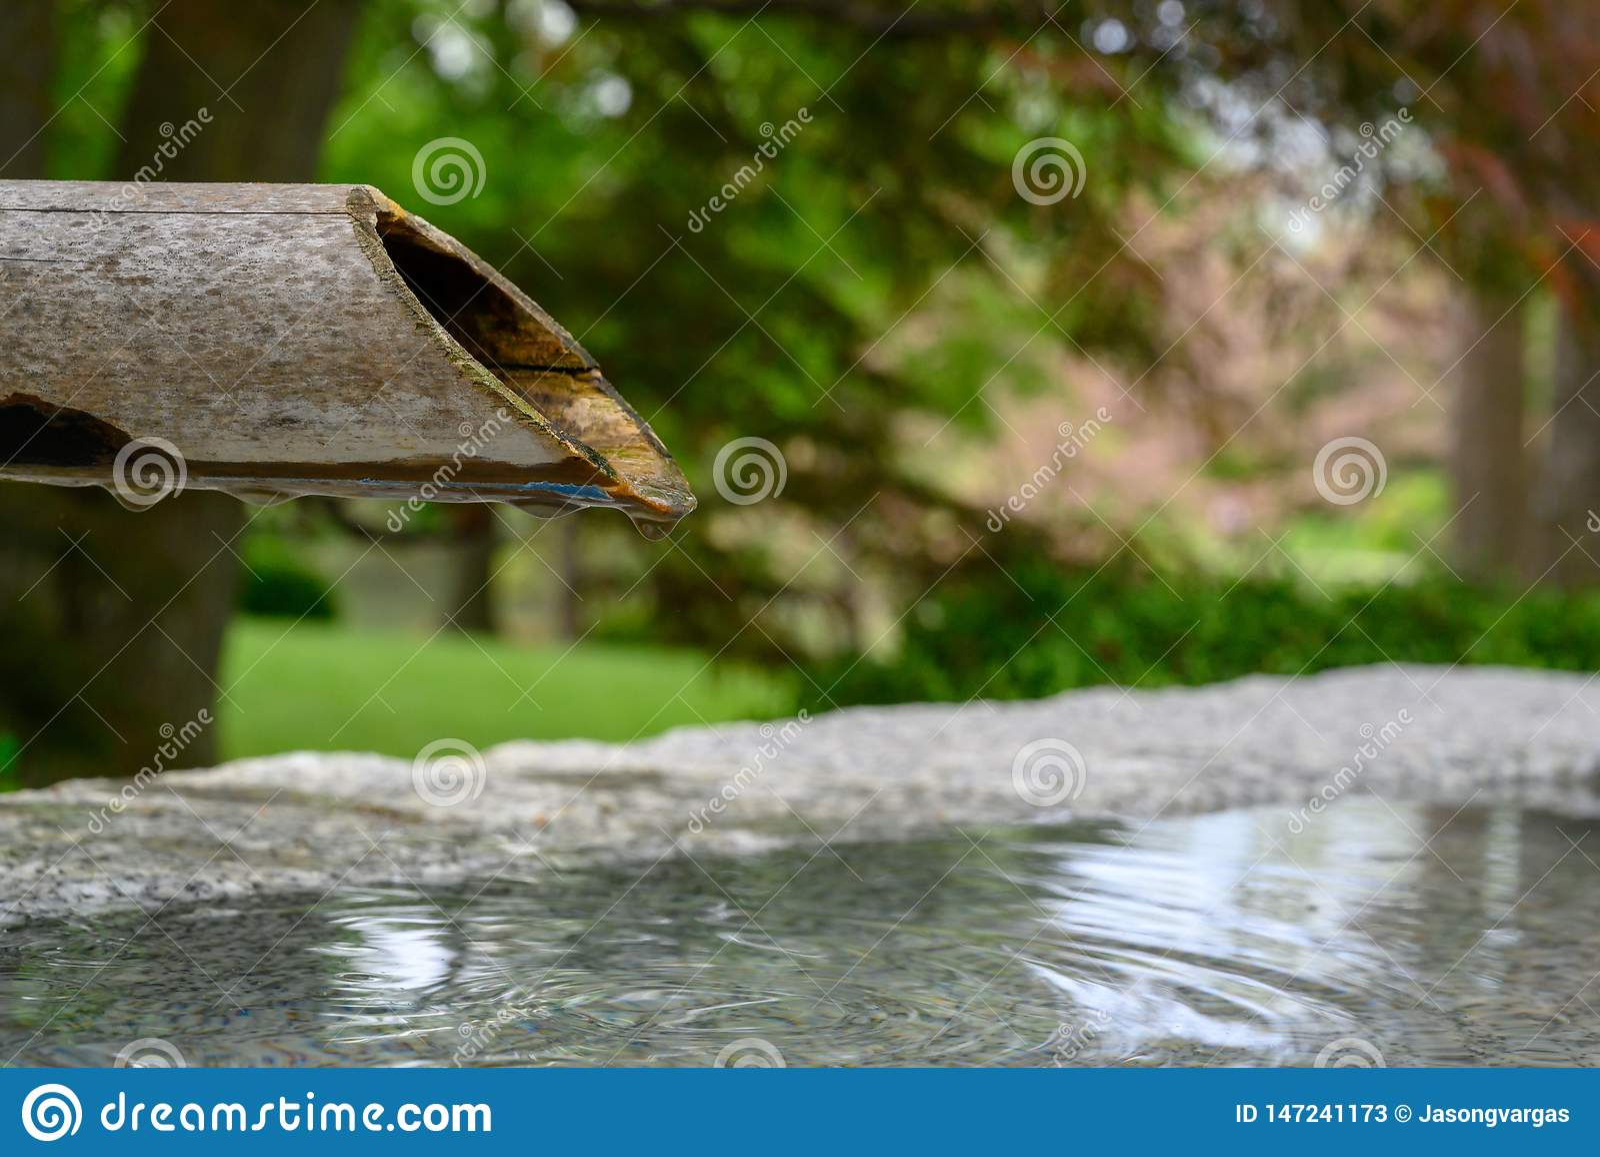 Un tubo de bamb? que gotea lentamente el agua